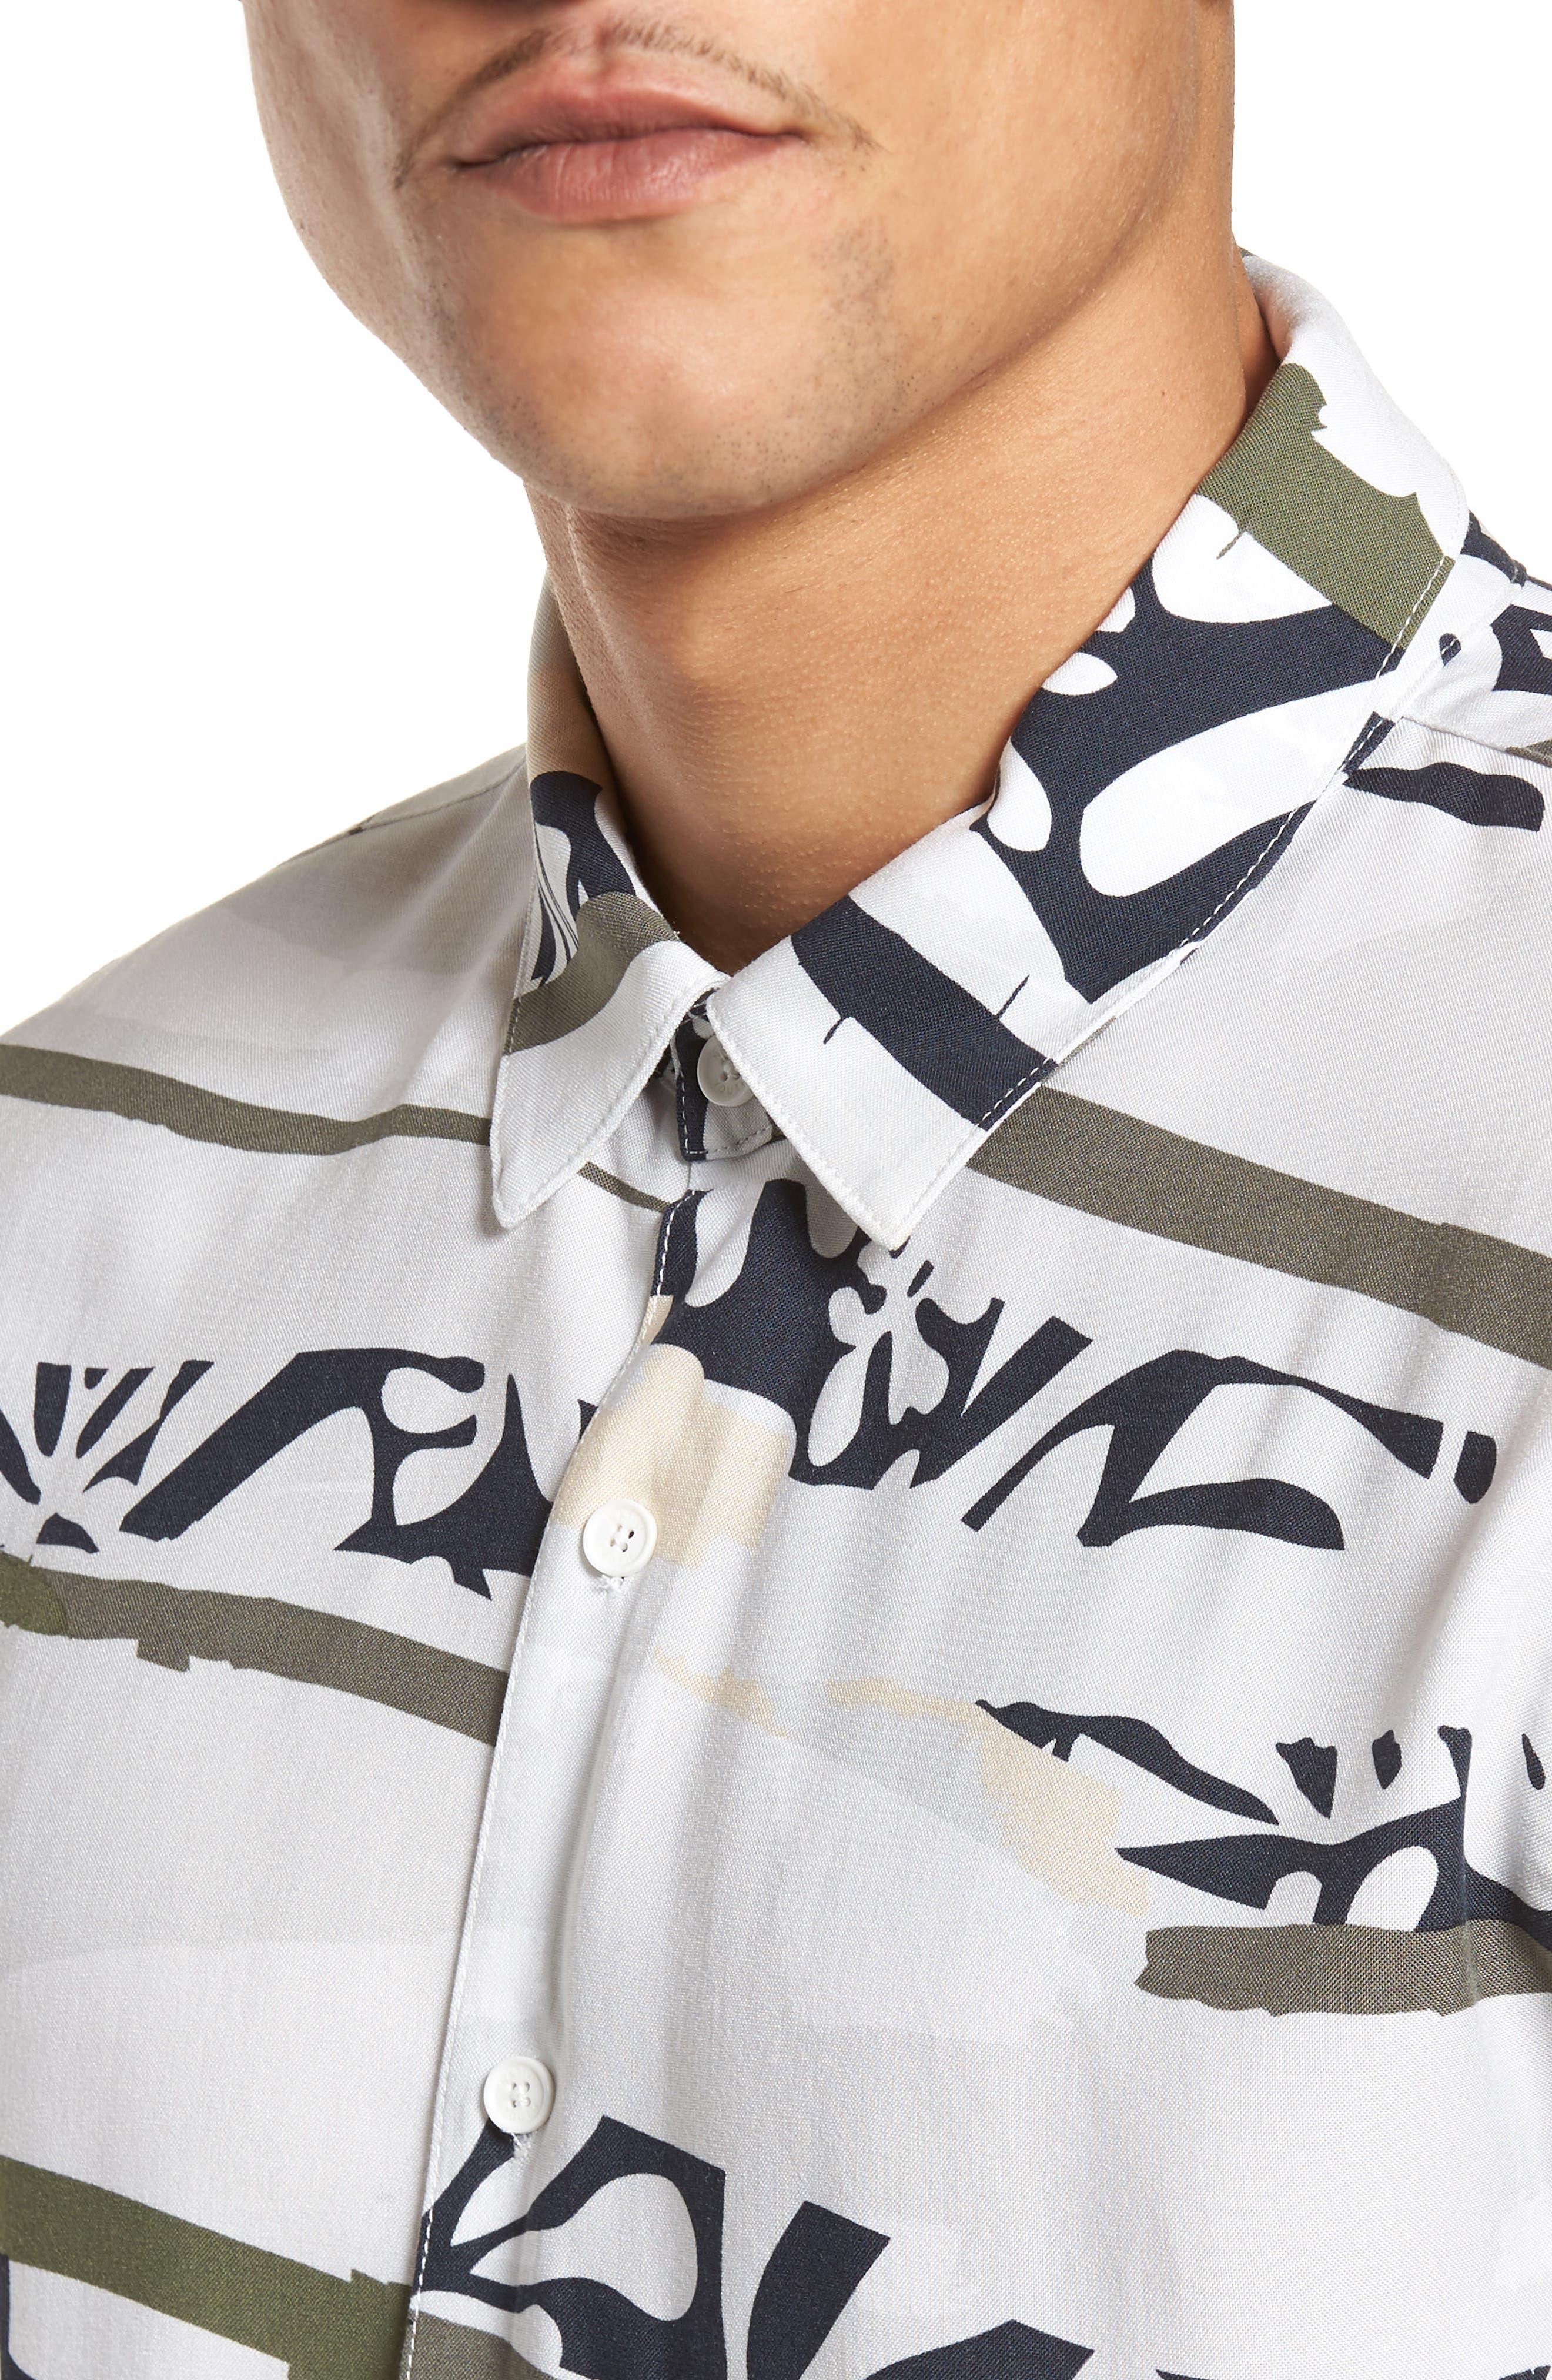 Tropi Camo Woven Shirt,                             Alternate thumbnail 4, color,                             100